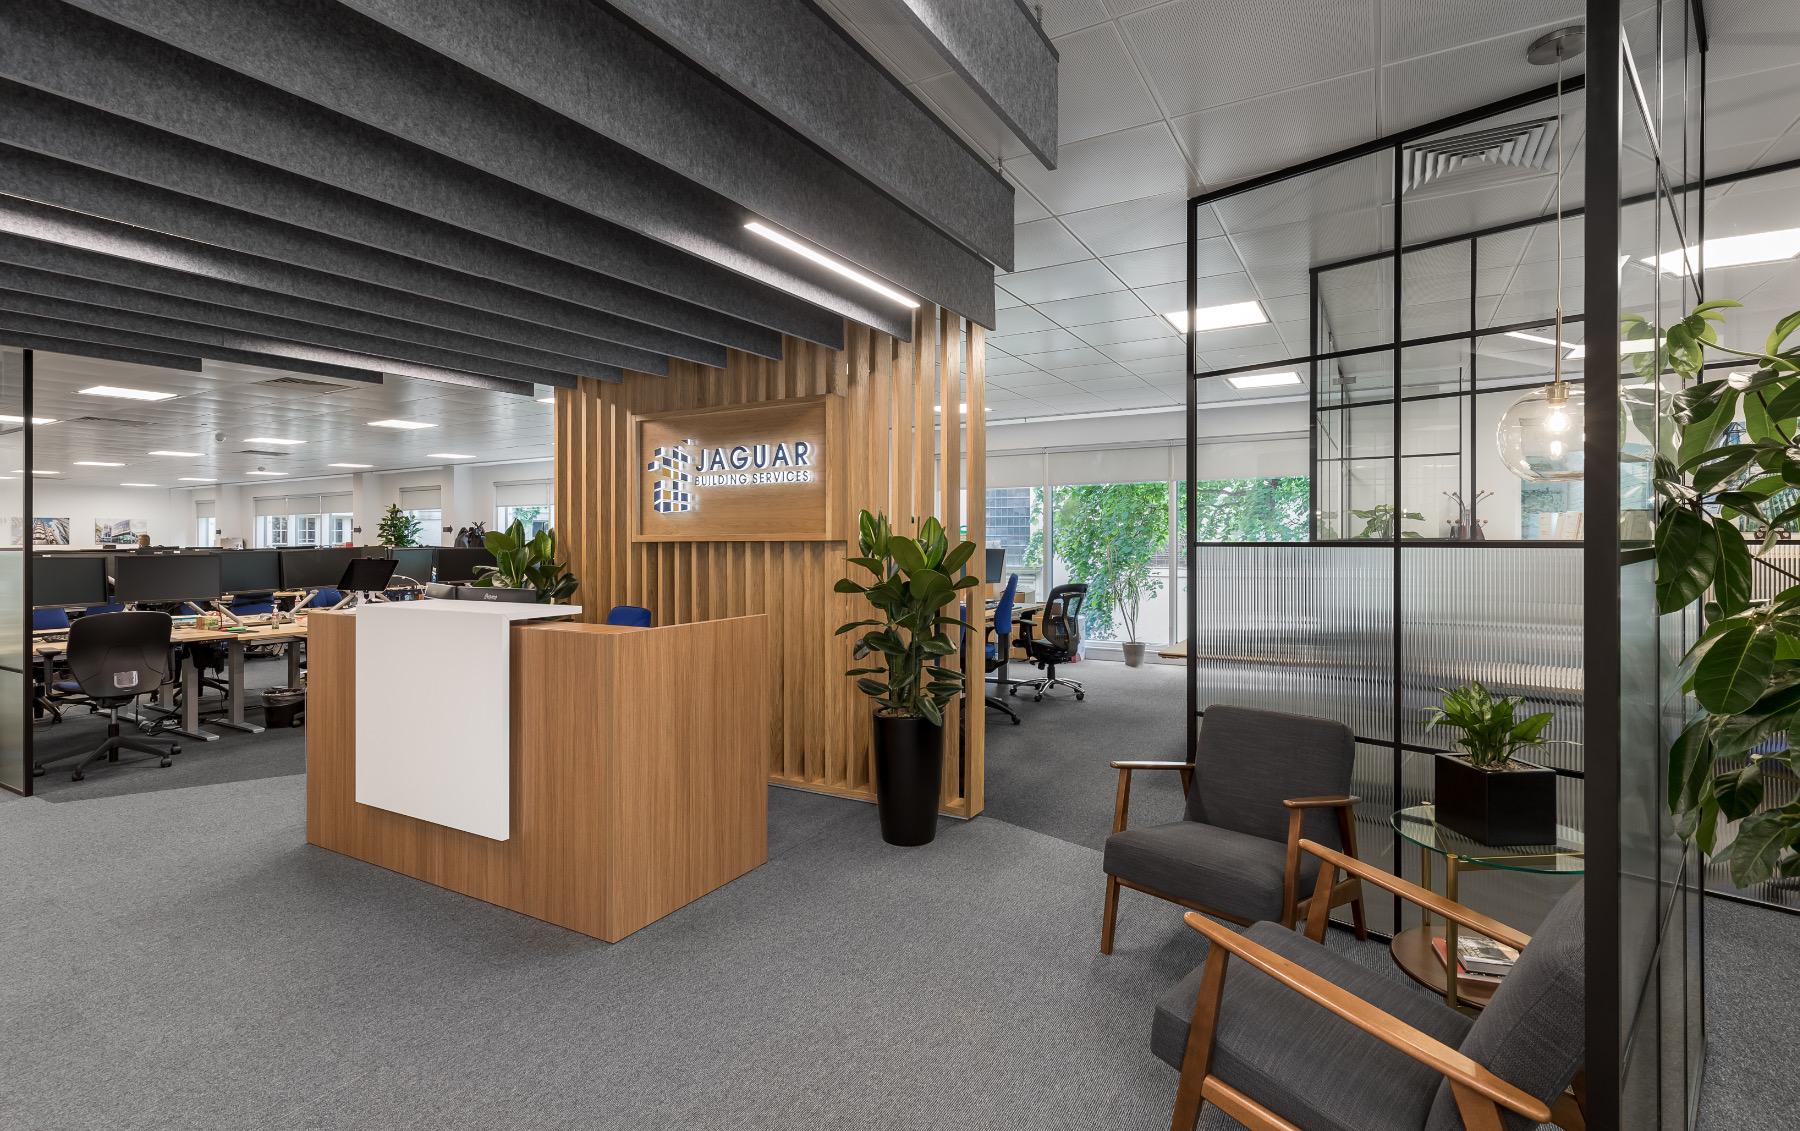 A Look Inside Jaguar Building Services' New London Office